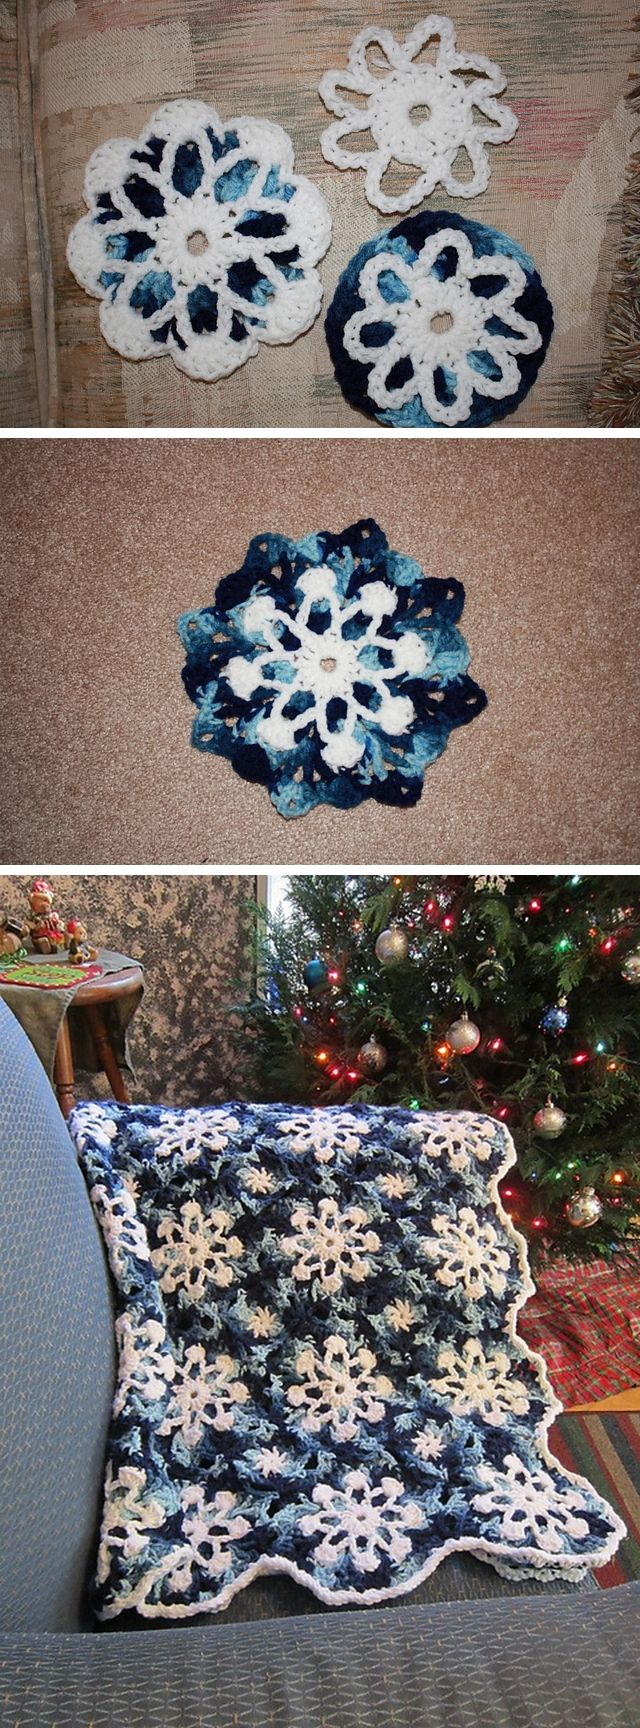 Gorgeous Dusty Snowflakes Throw - Free Crochet Pattern